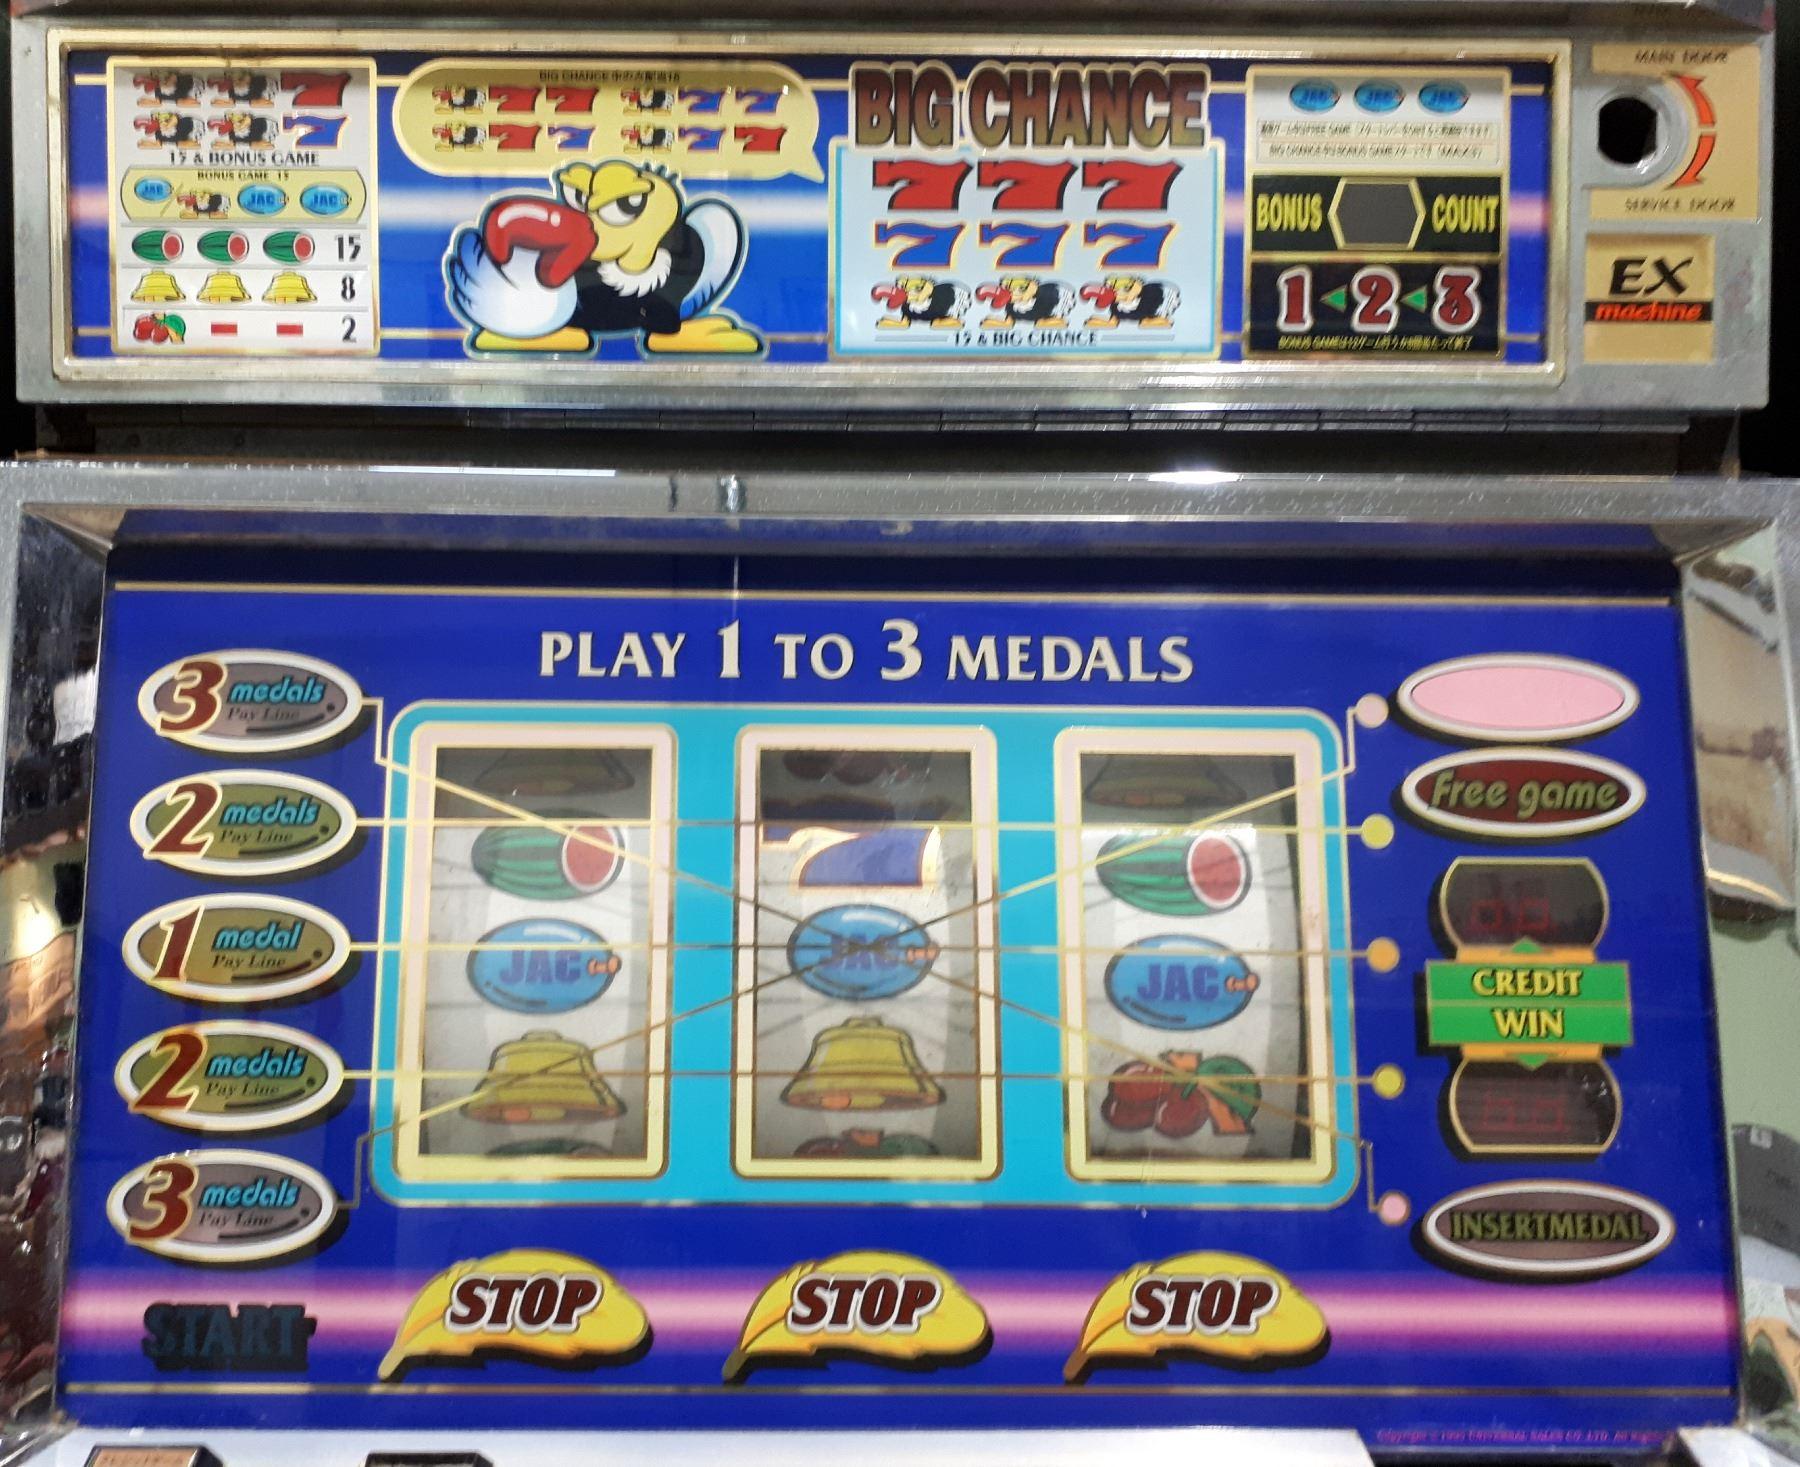 Holland gambling